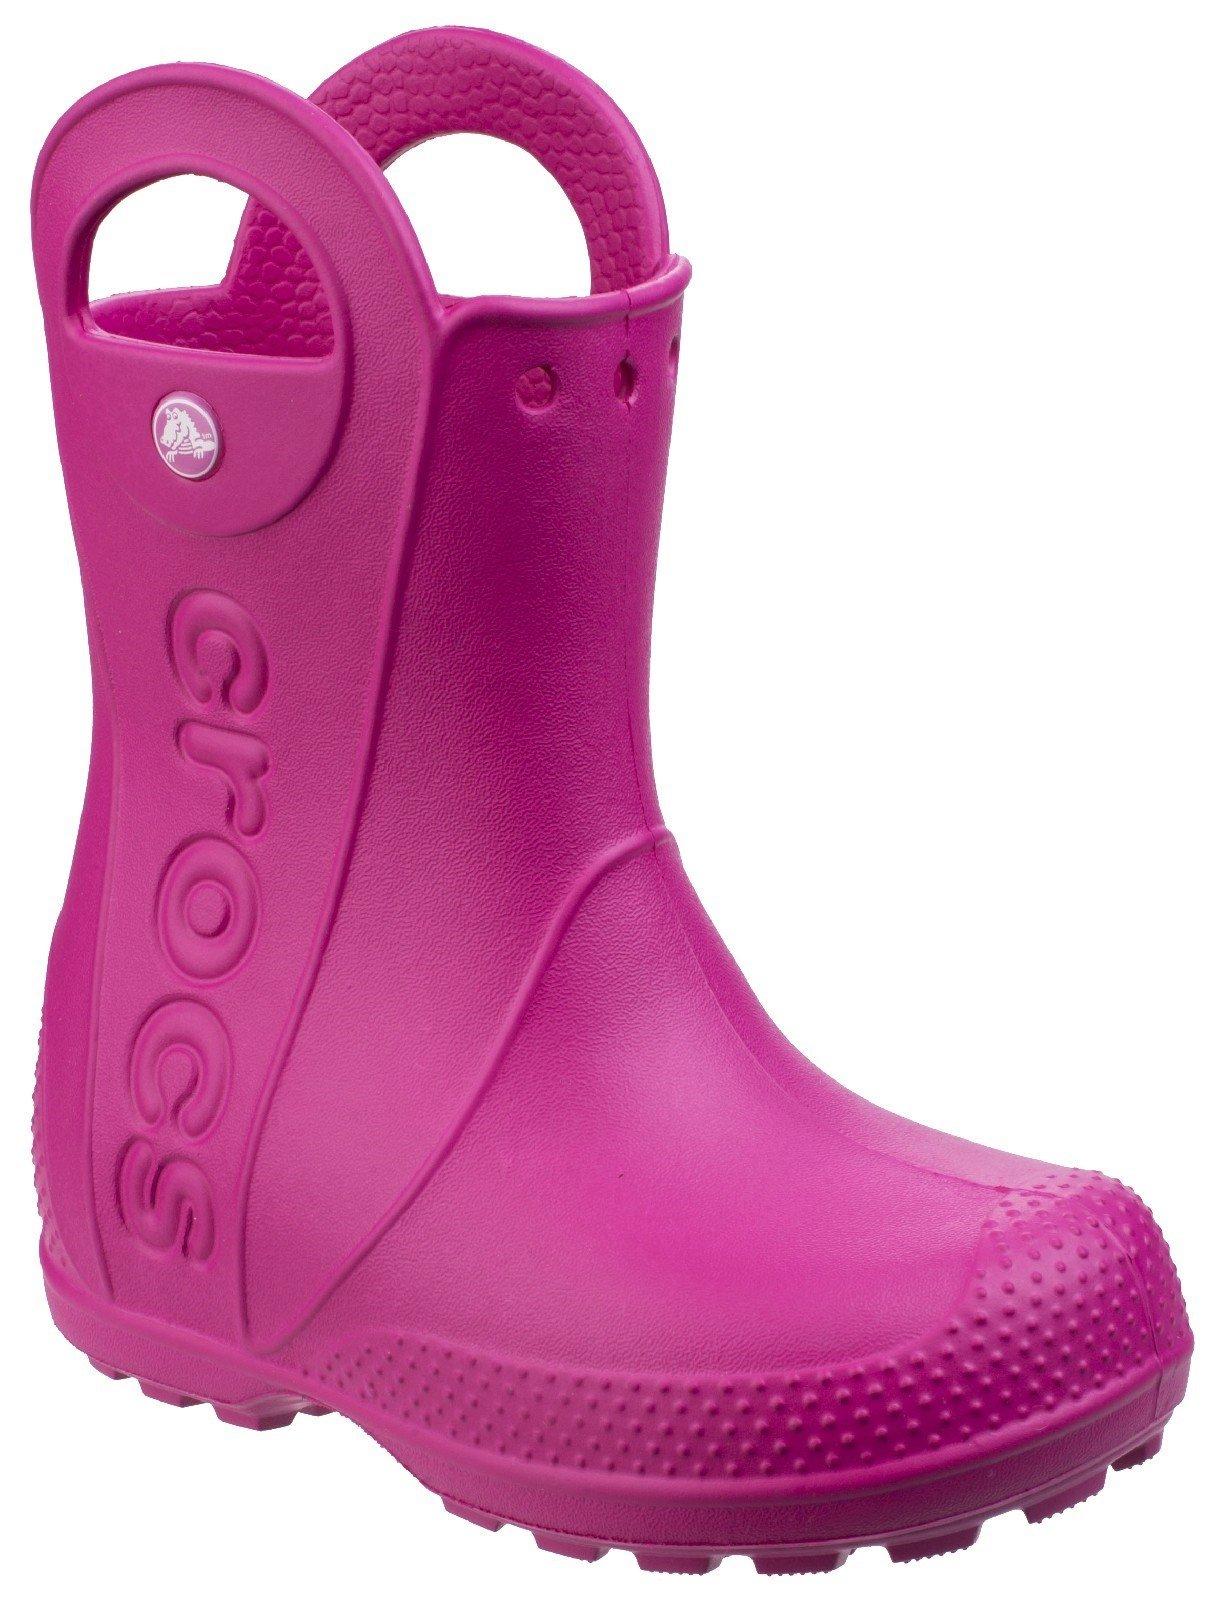 Crocs Kid's Rain Boot Various Colours 21080 - Candy Pink 6 UK